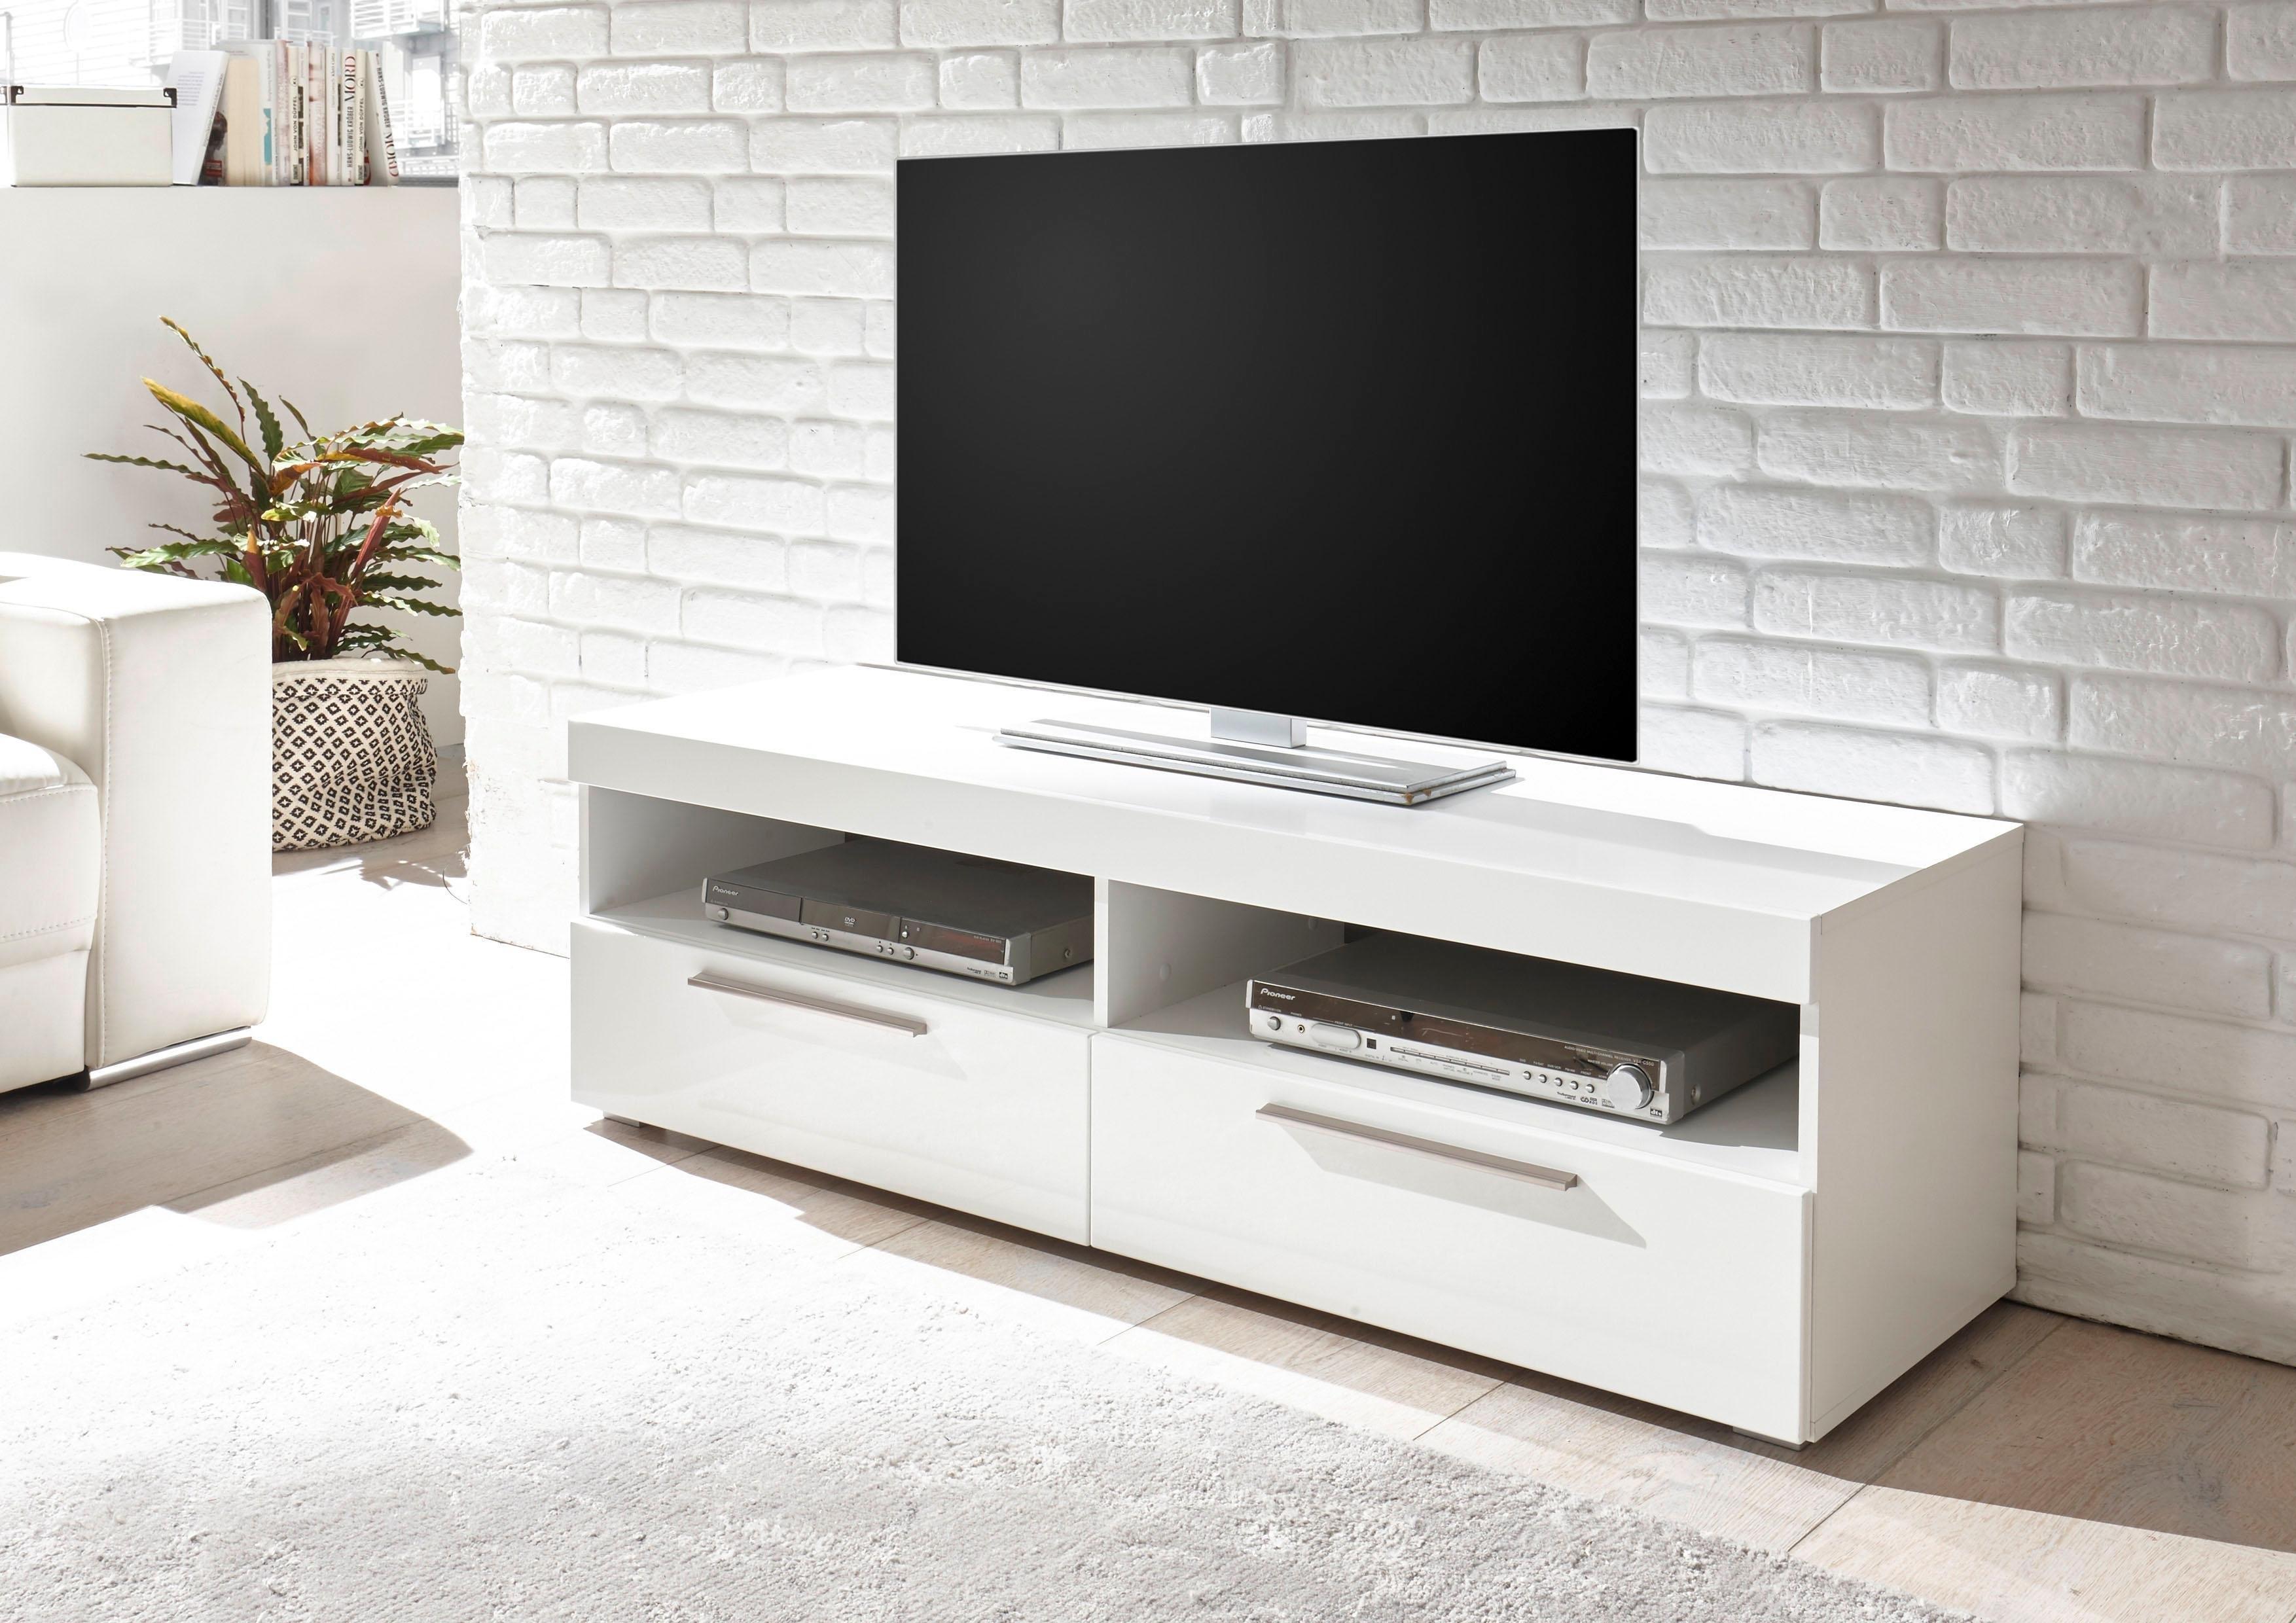 Bruno Banani tv-meubel »GOBA«, breedte 142 cm - verschillende betaalmethodes